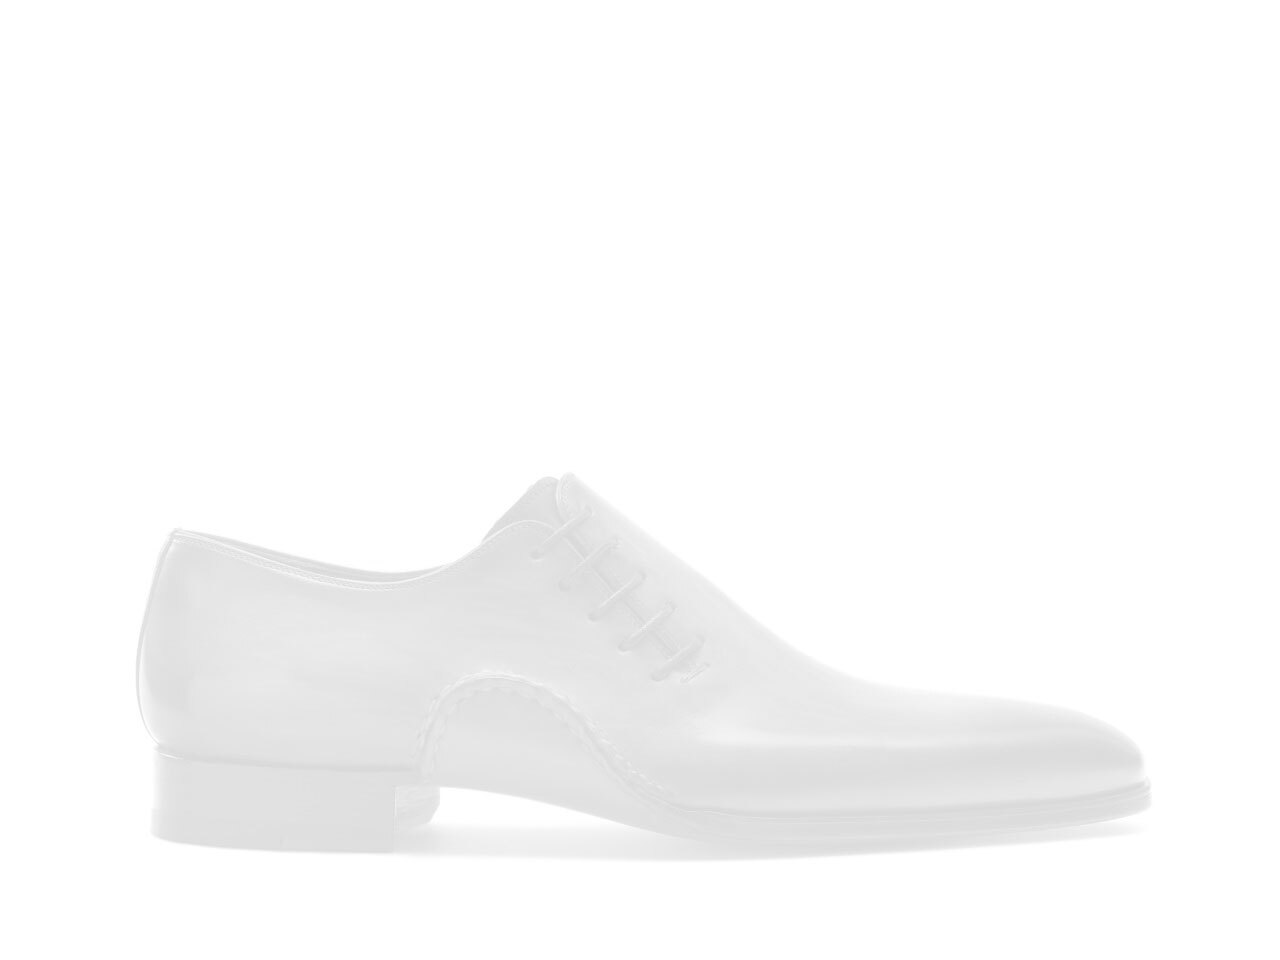 Sole of the Magnanni Carrera Curri Men's Single Monk Strap Shoes